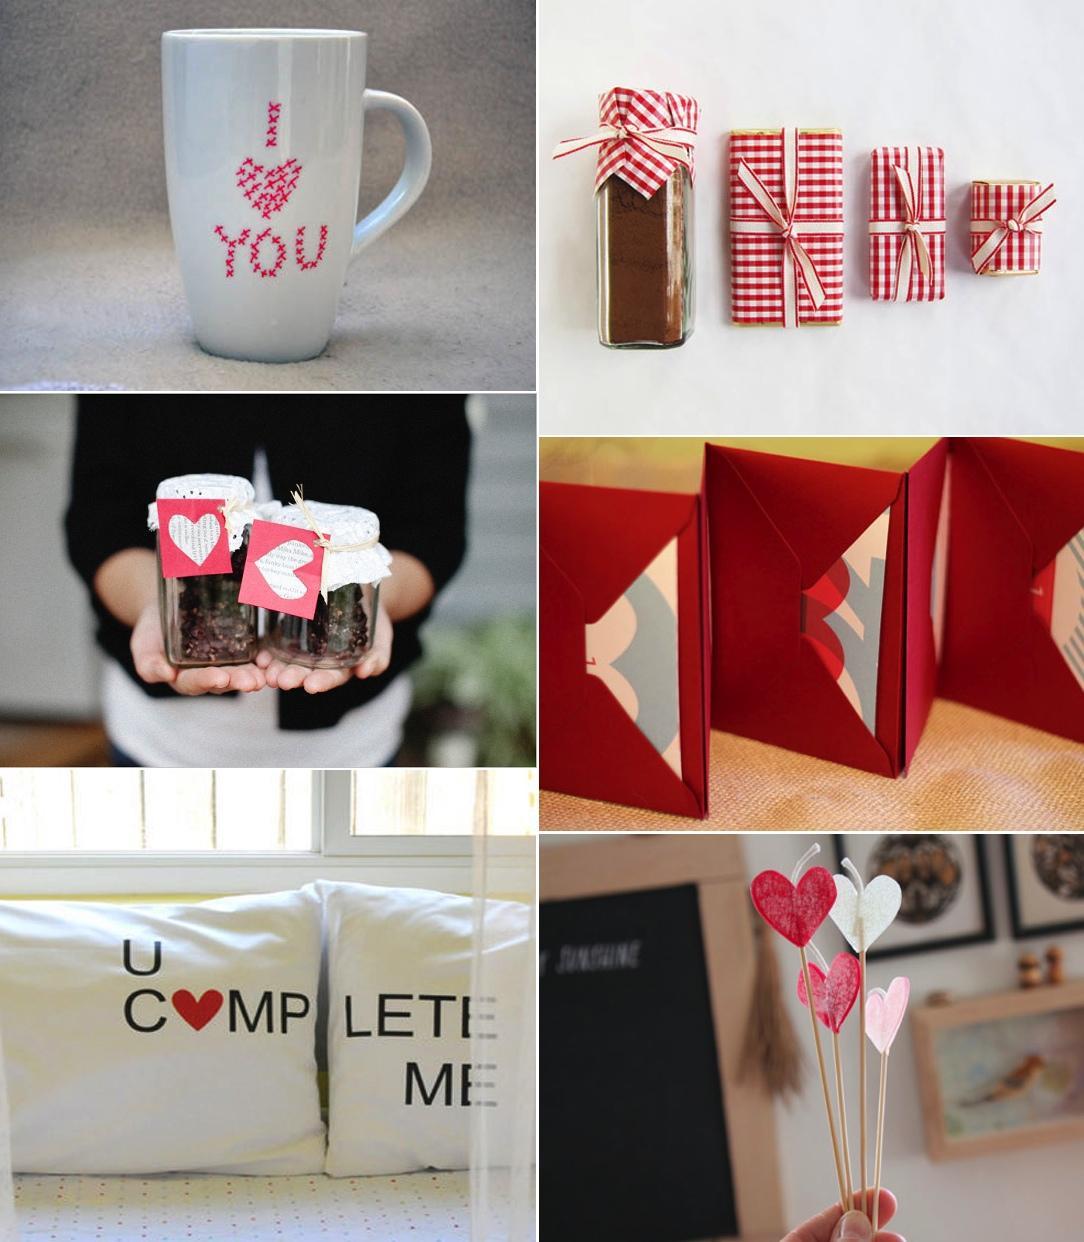 Sunday post diy detalles de san vanlentin diy valentines favors copy